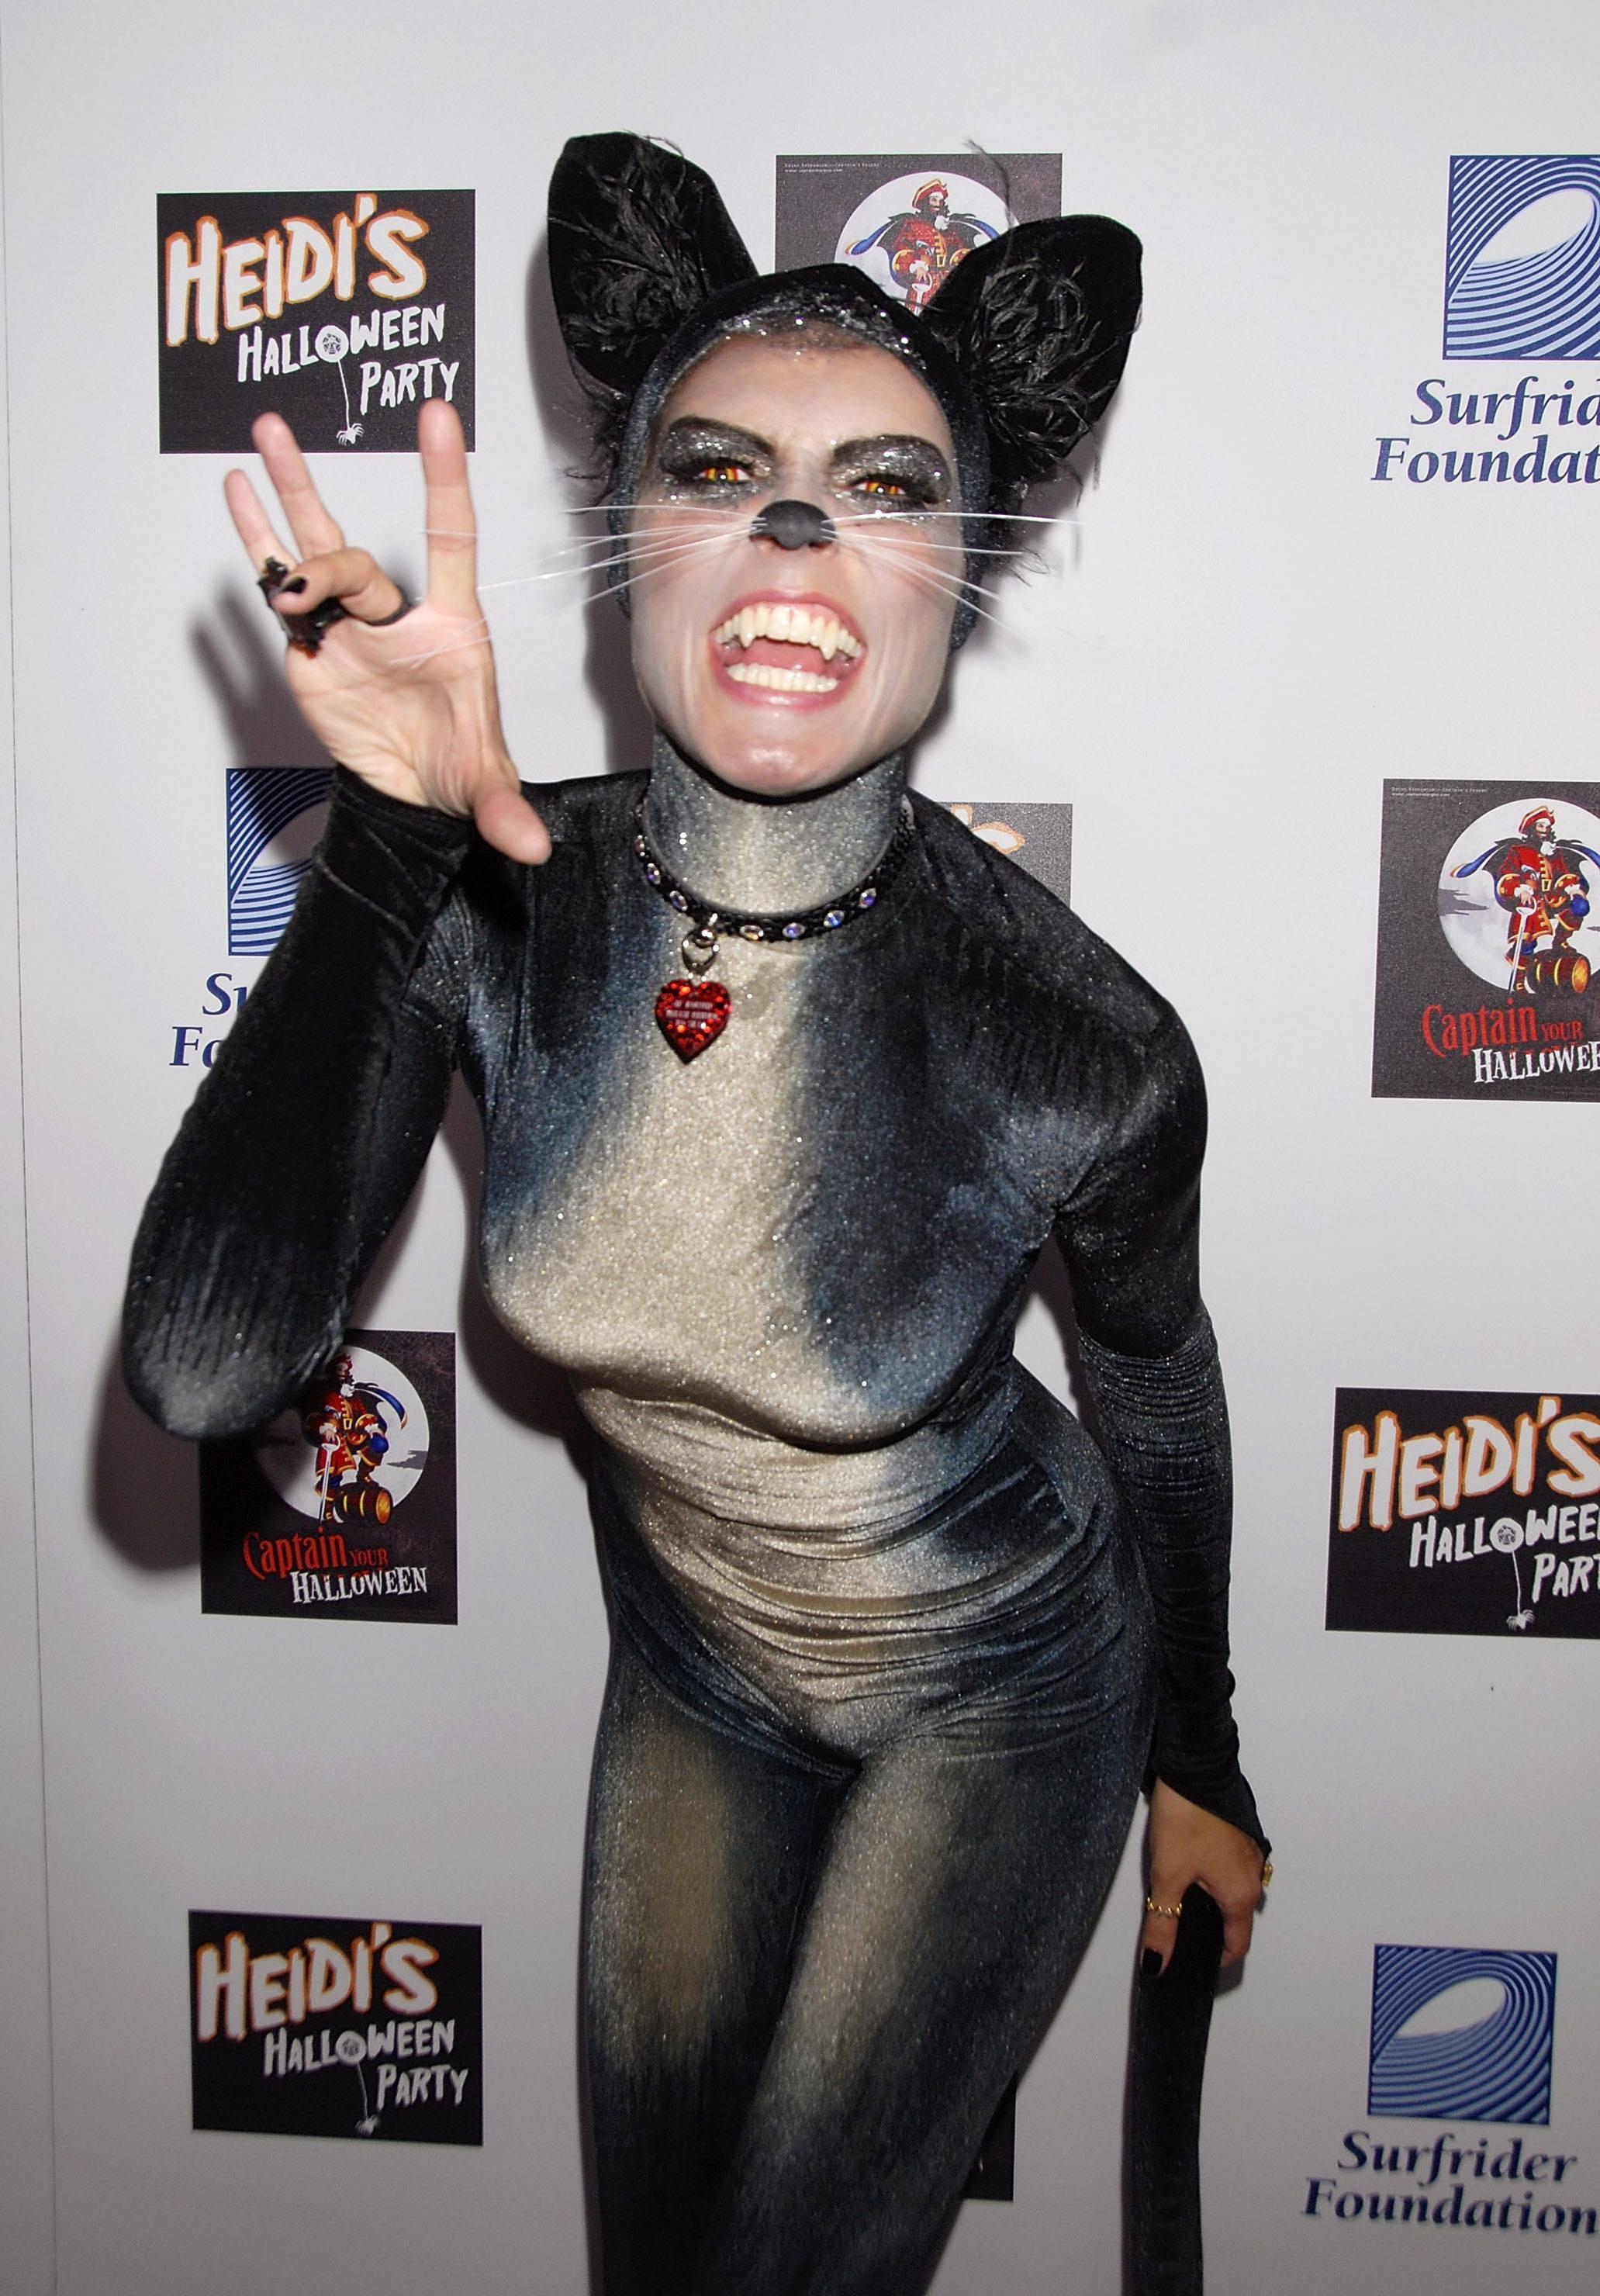 Heidi Klum's 8th Annual Halloween Party